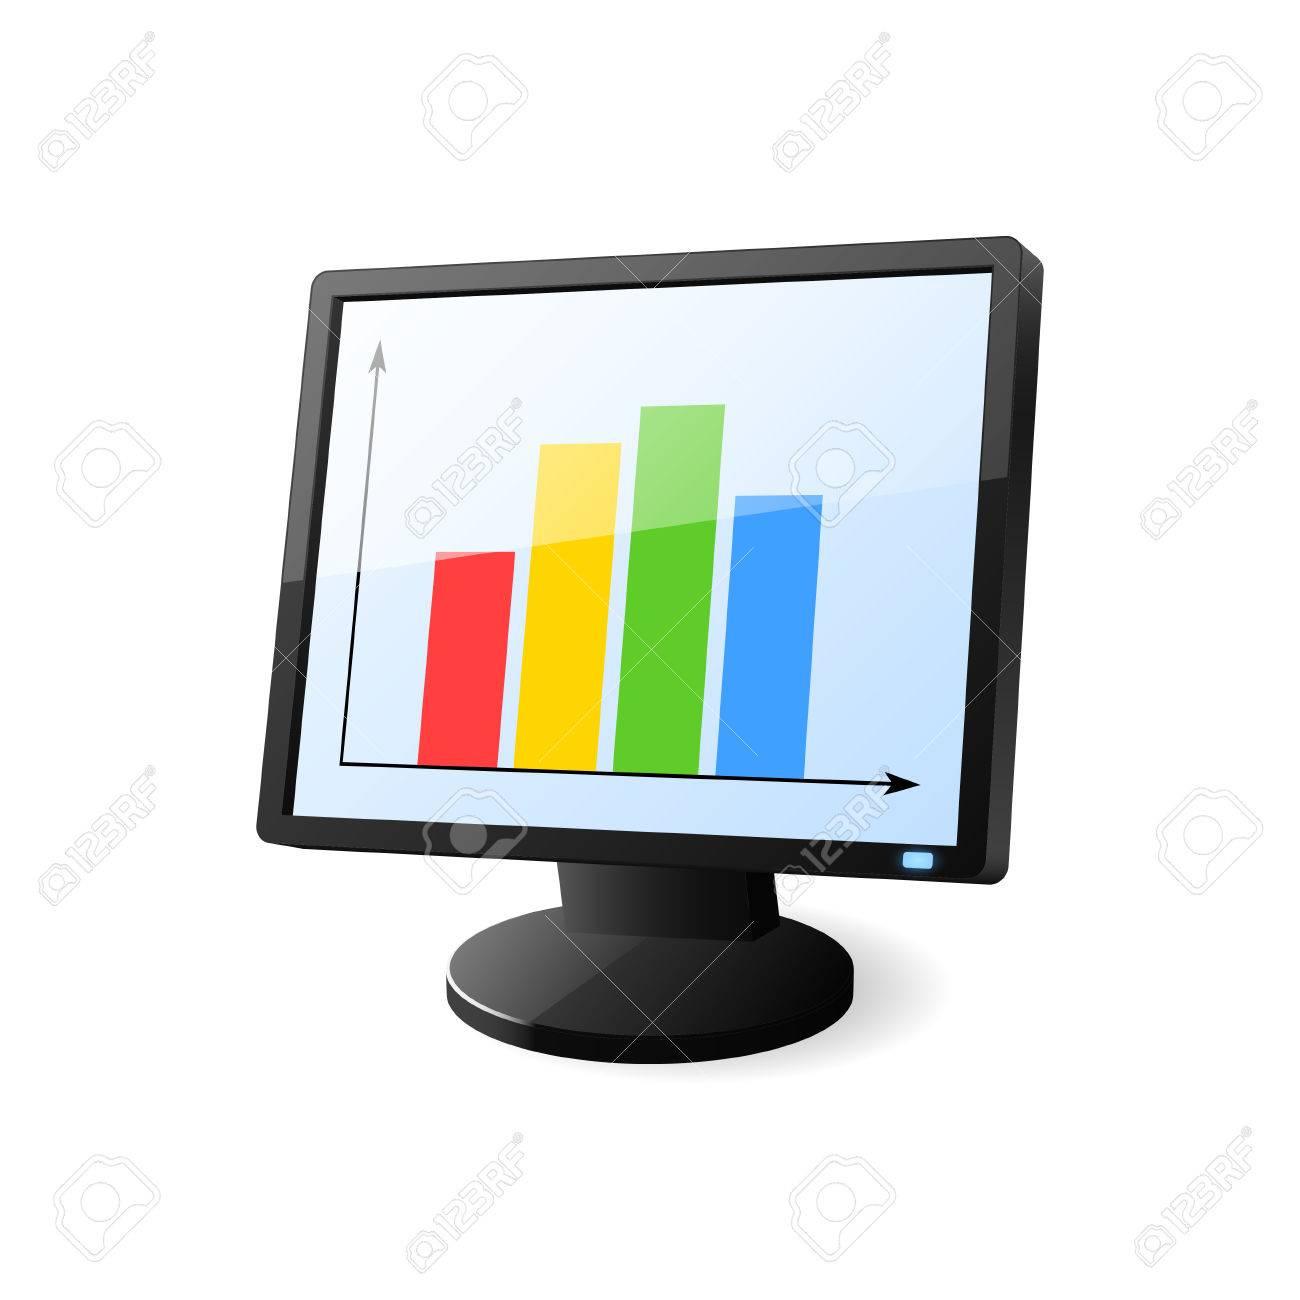 desktop computer with diagram on screen vector illustration